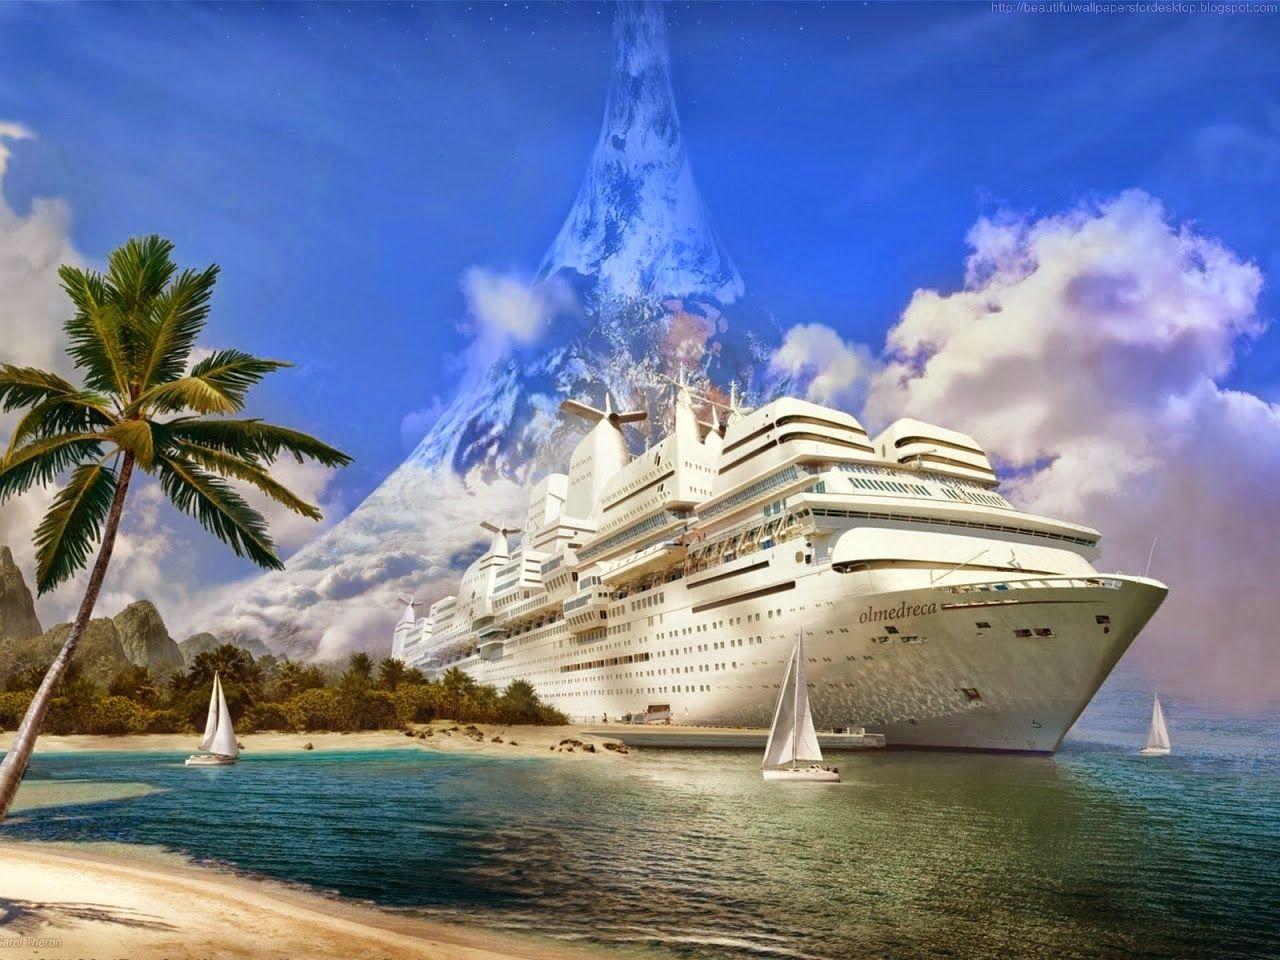 4k Ultra Hd Cruise Ship Wallpapers Top Free 4k Ultra Hd